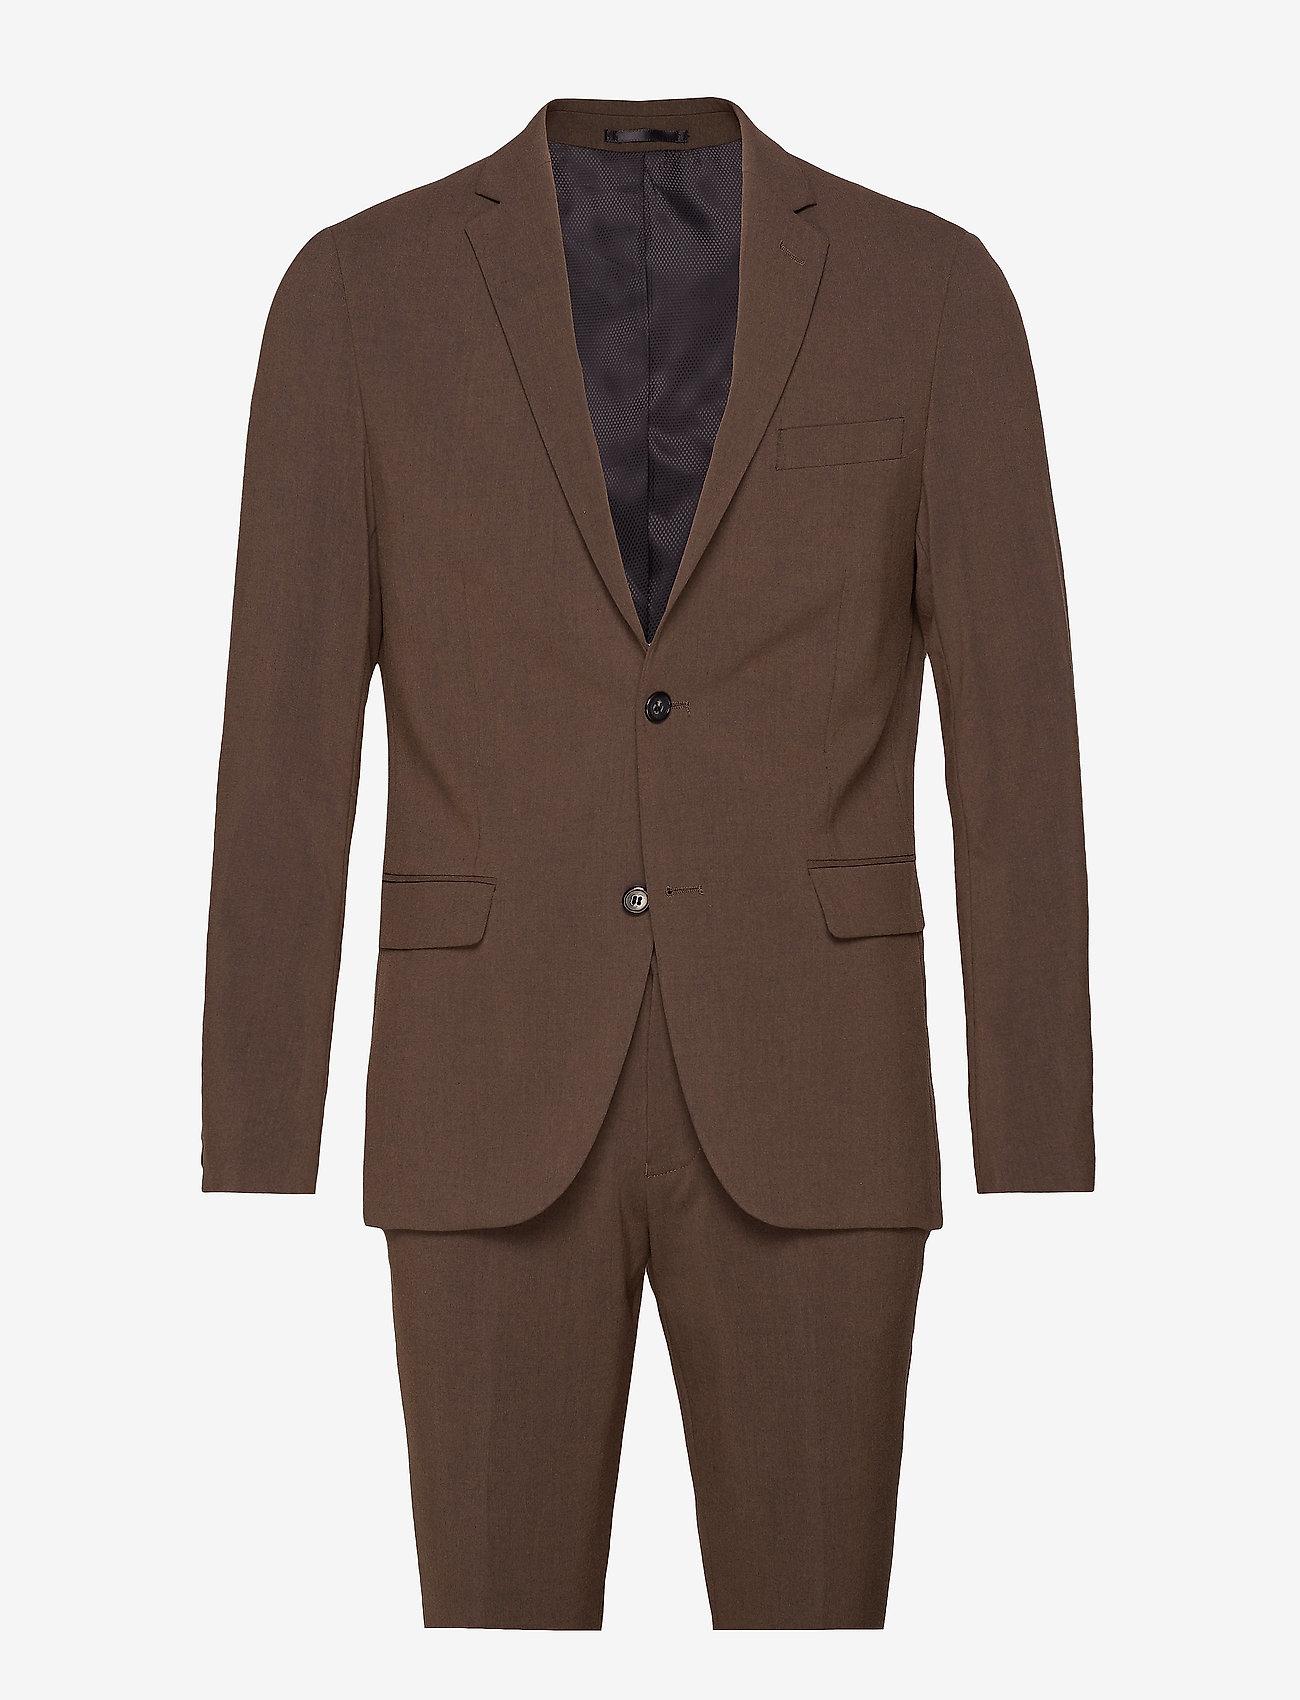 Lindbergh - Plain mens suit - yksiriviset puvut - brown mel - 0